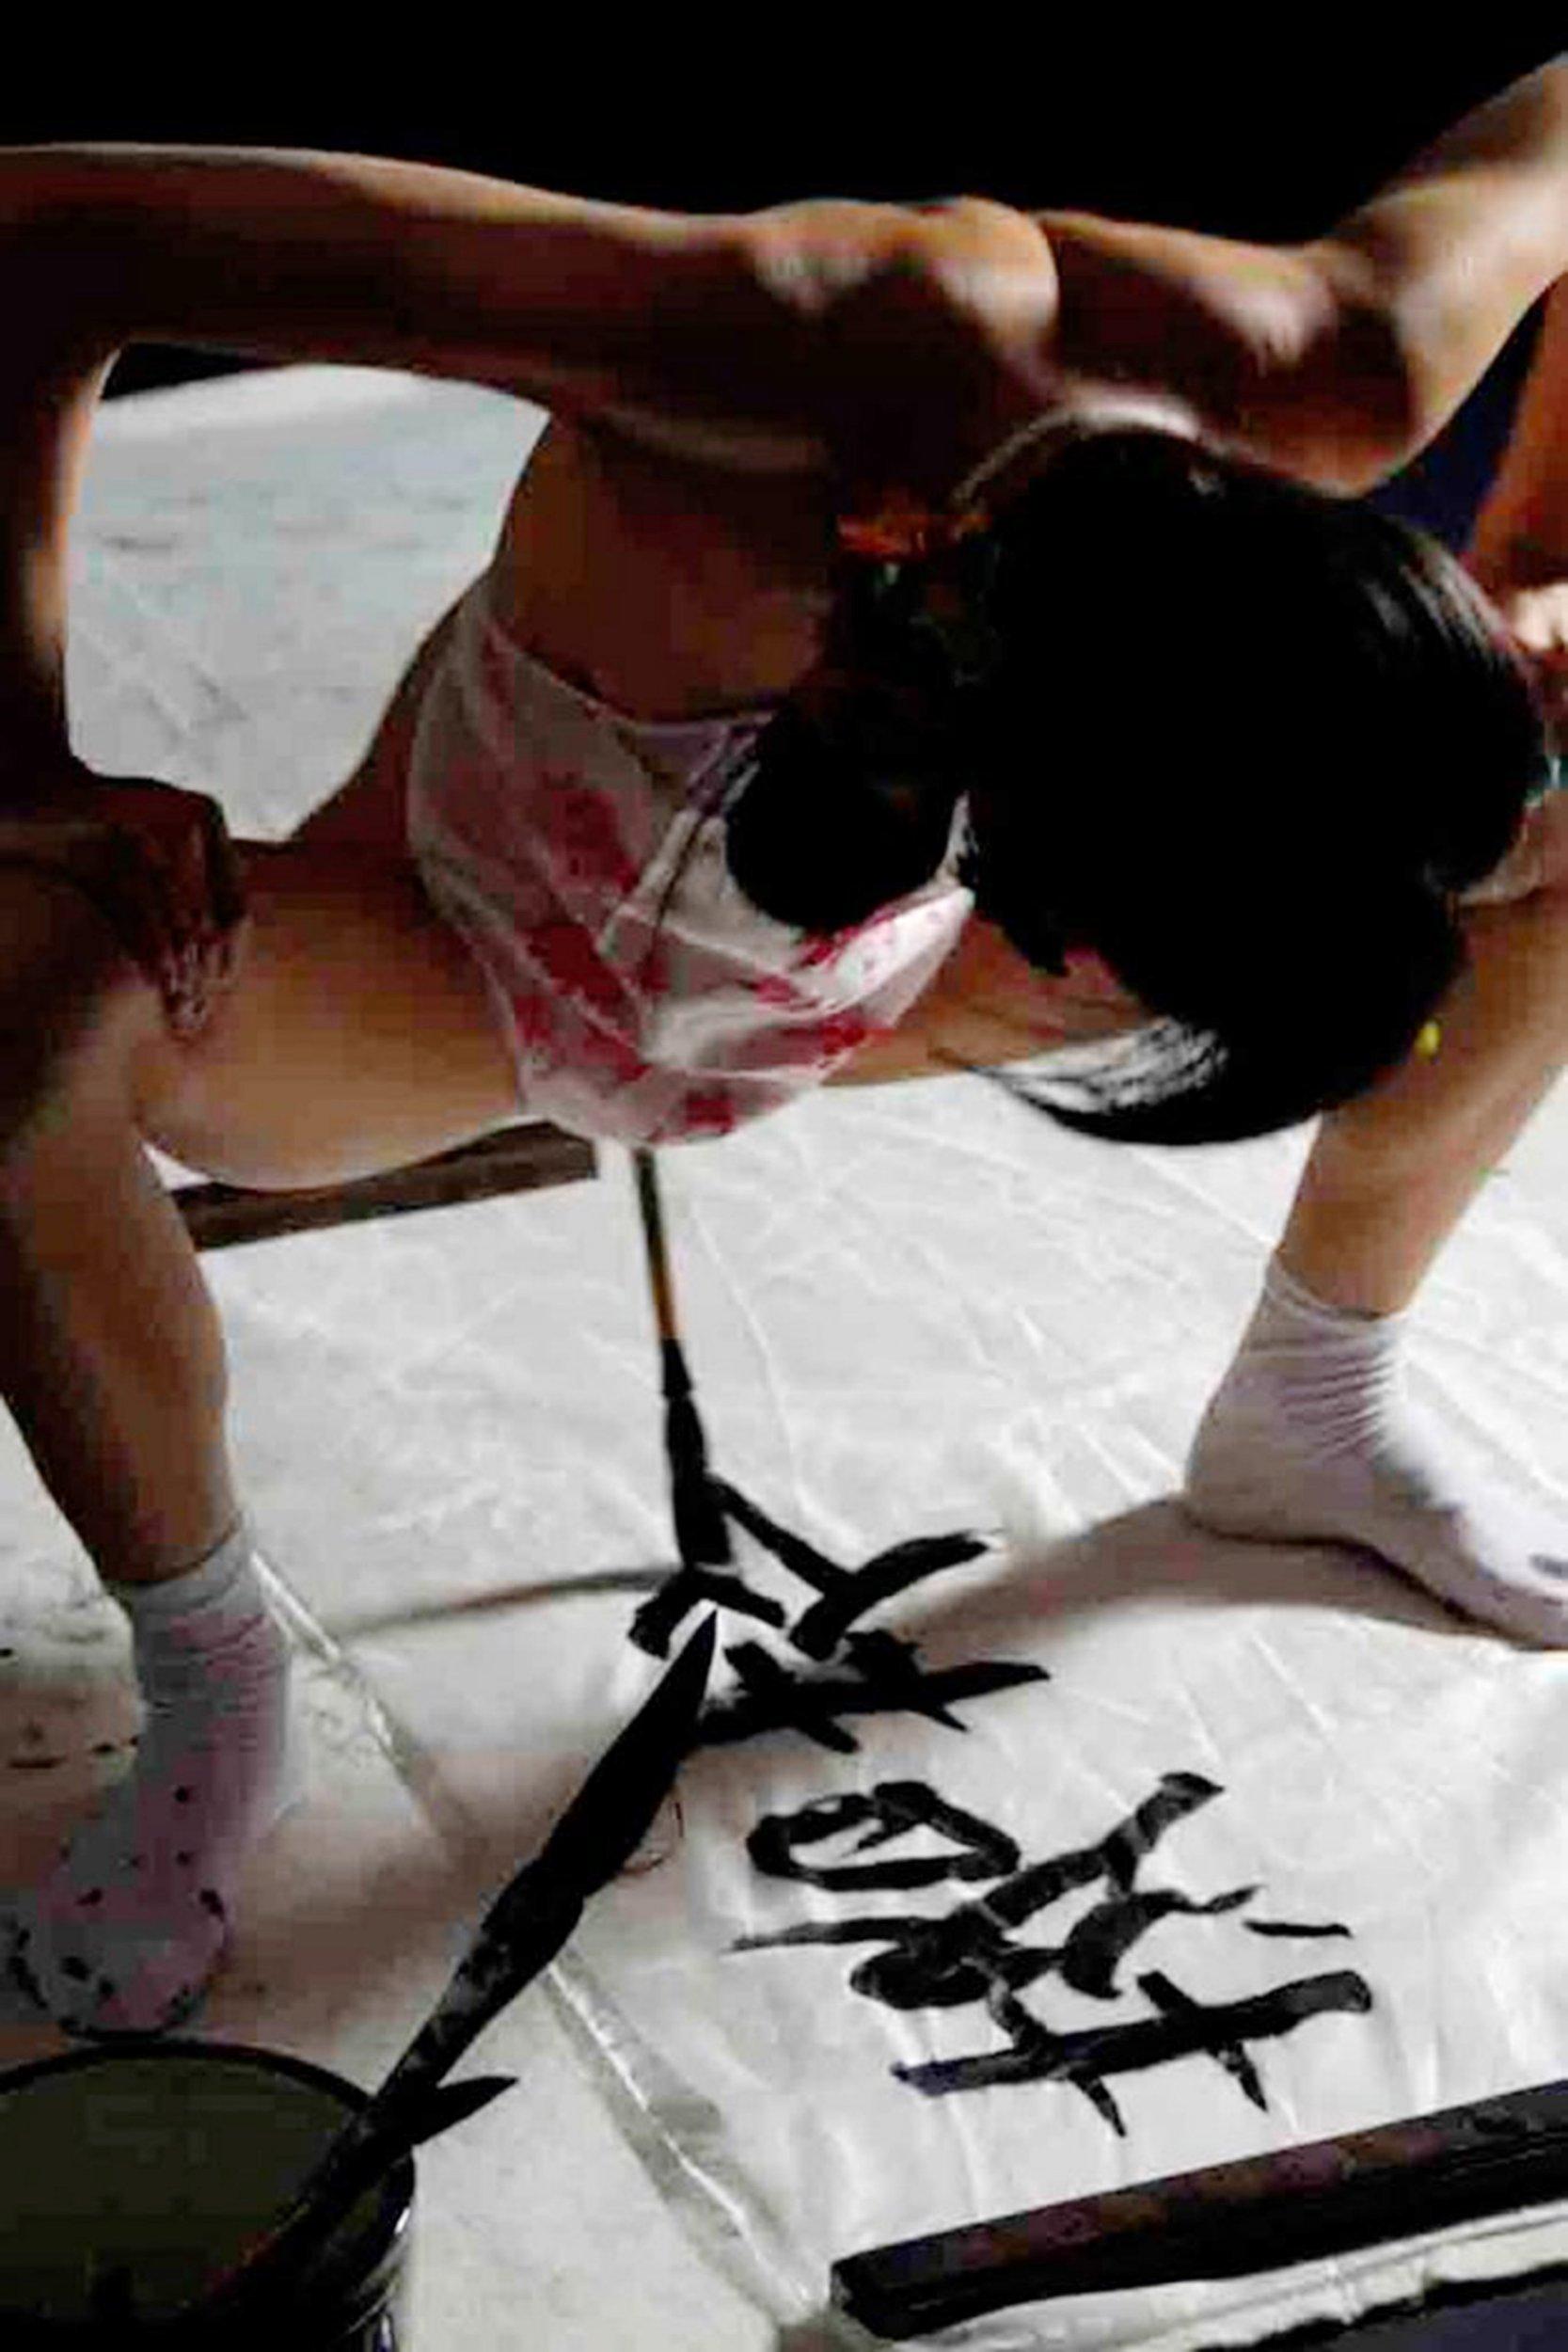 Artist creates 'beautiful, provocative'… vagina calligraphy